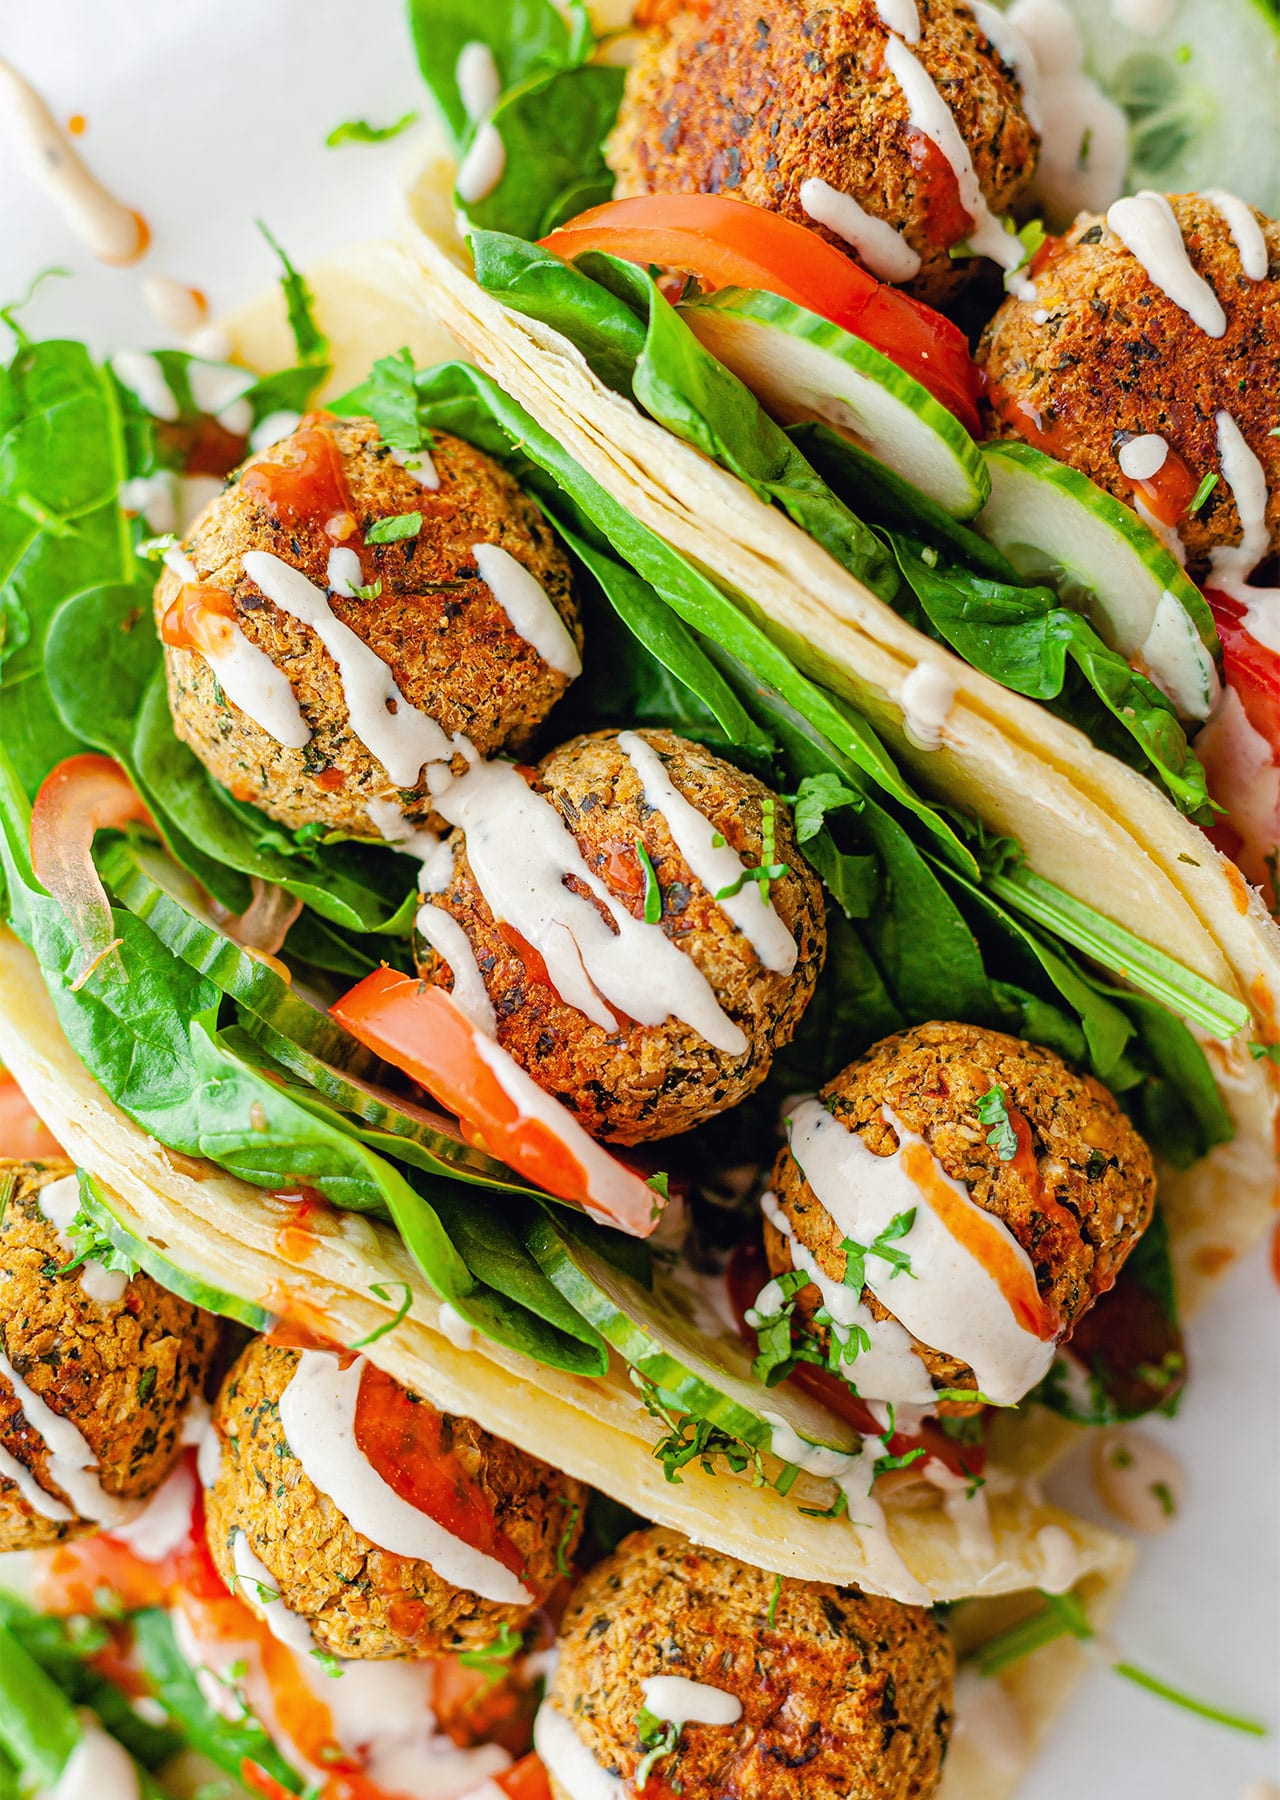 Vegan Easy Baked Healthy Recipe